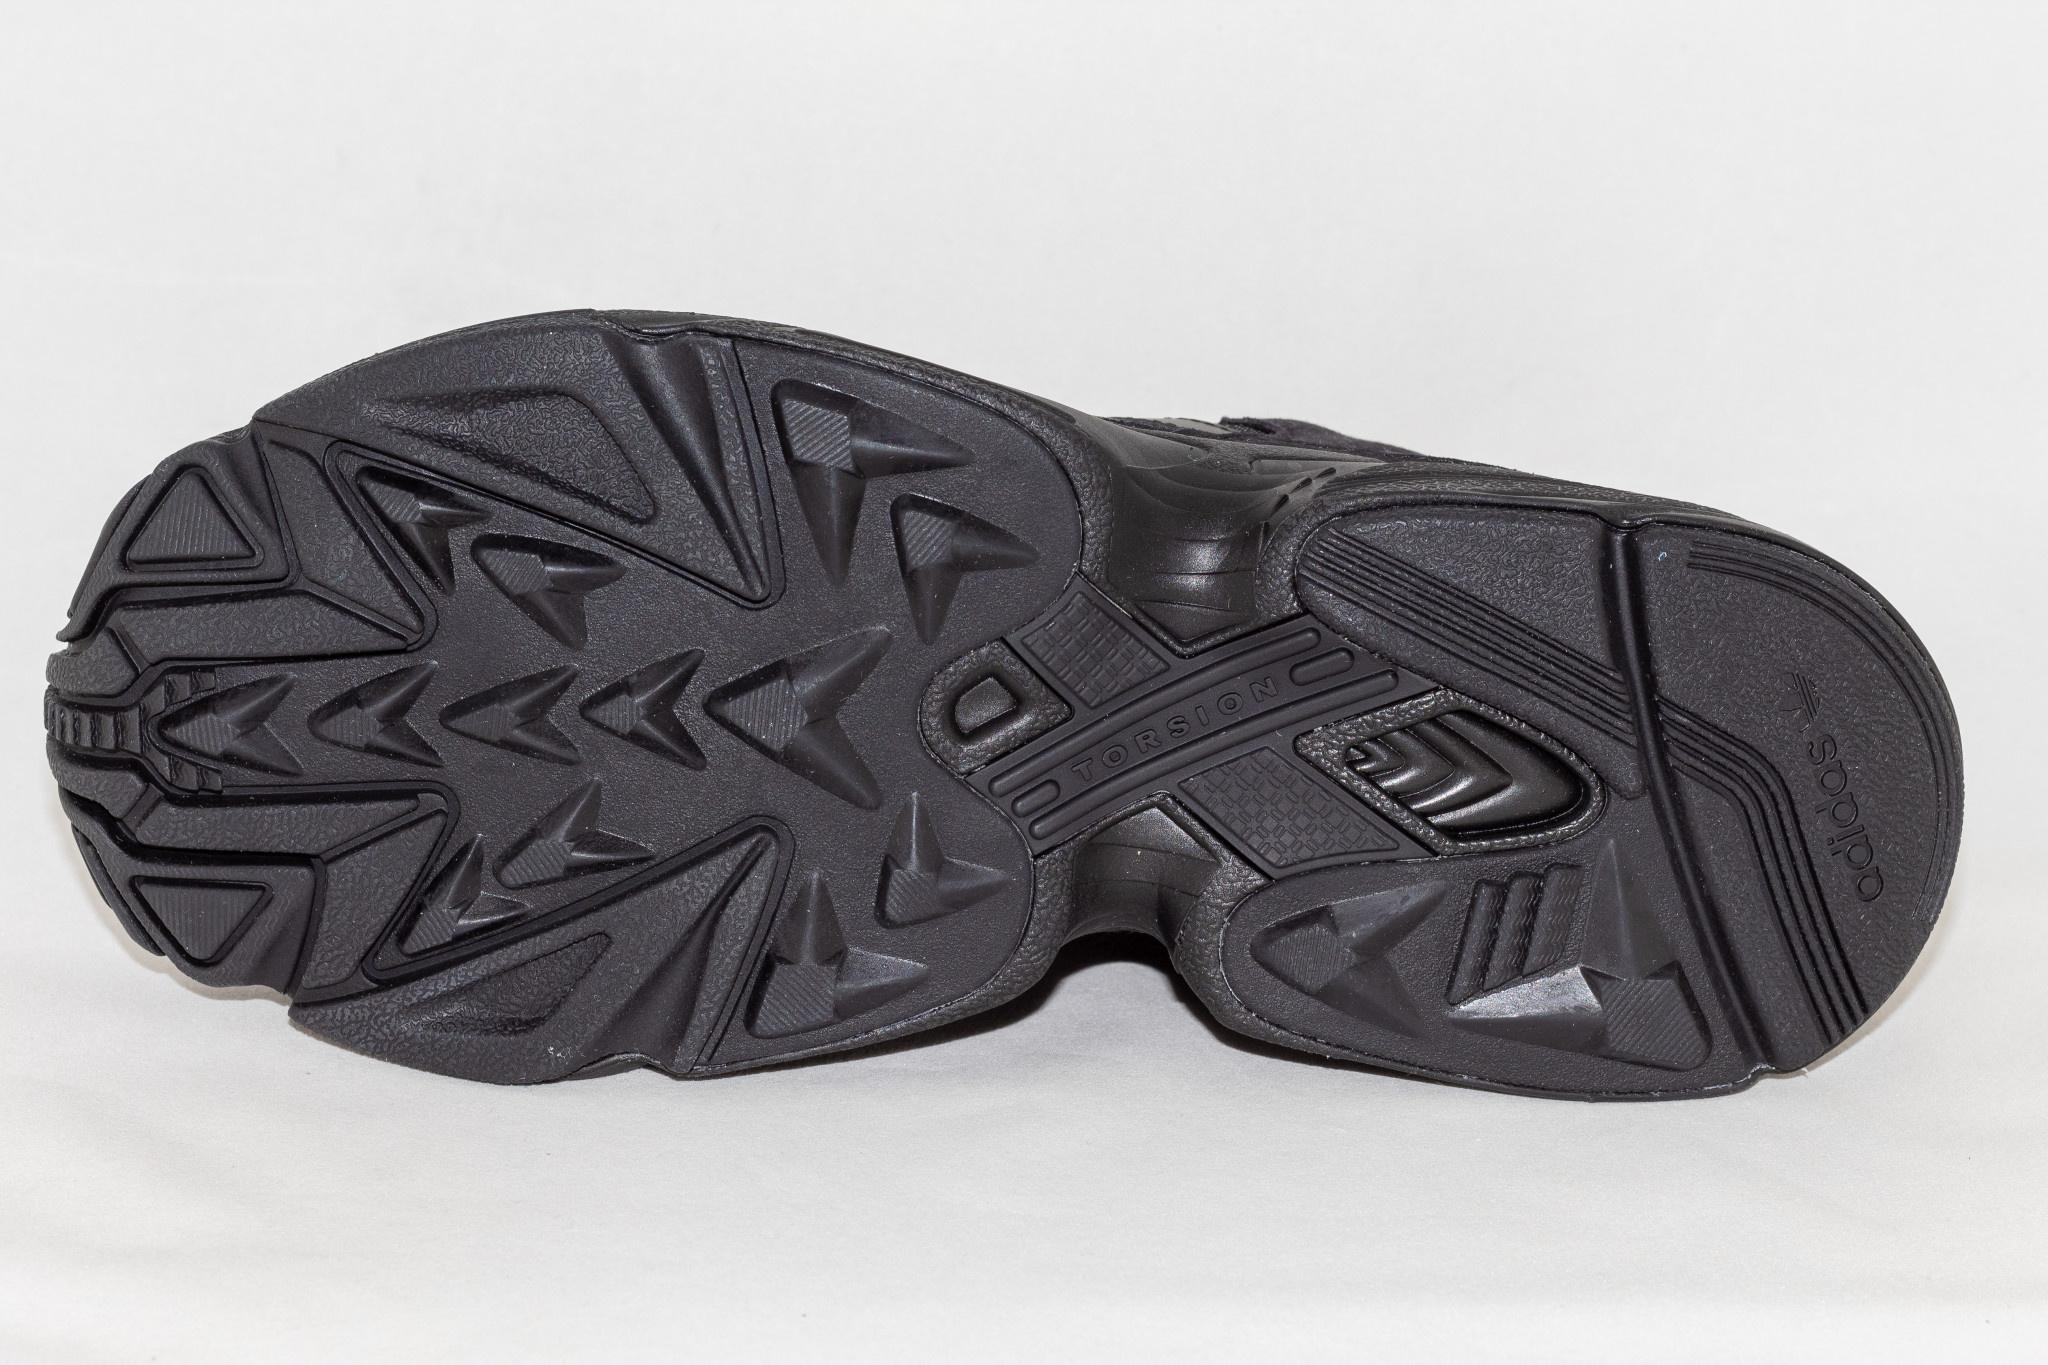 Adidas YUNG-96 Cblack/ Cblack/ Carbon